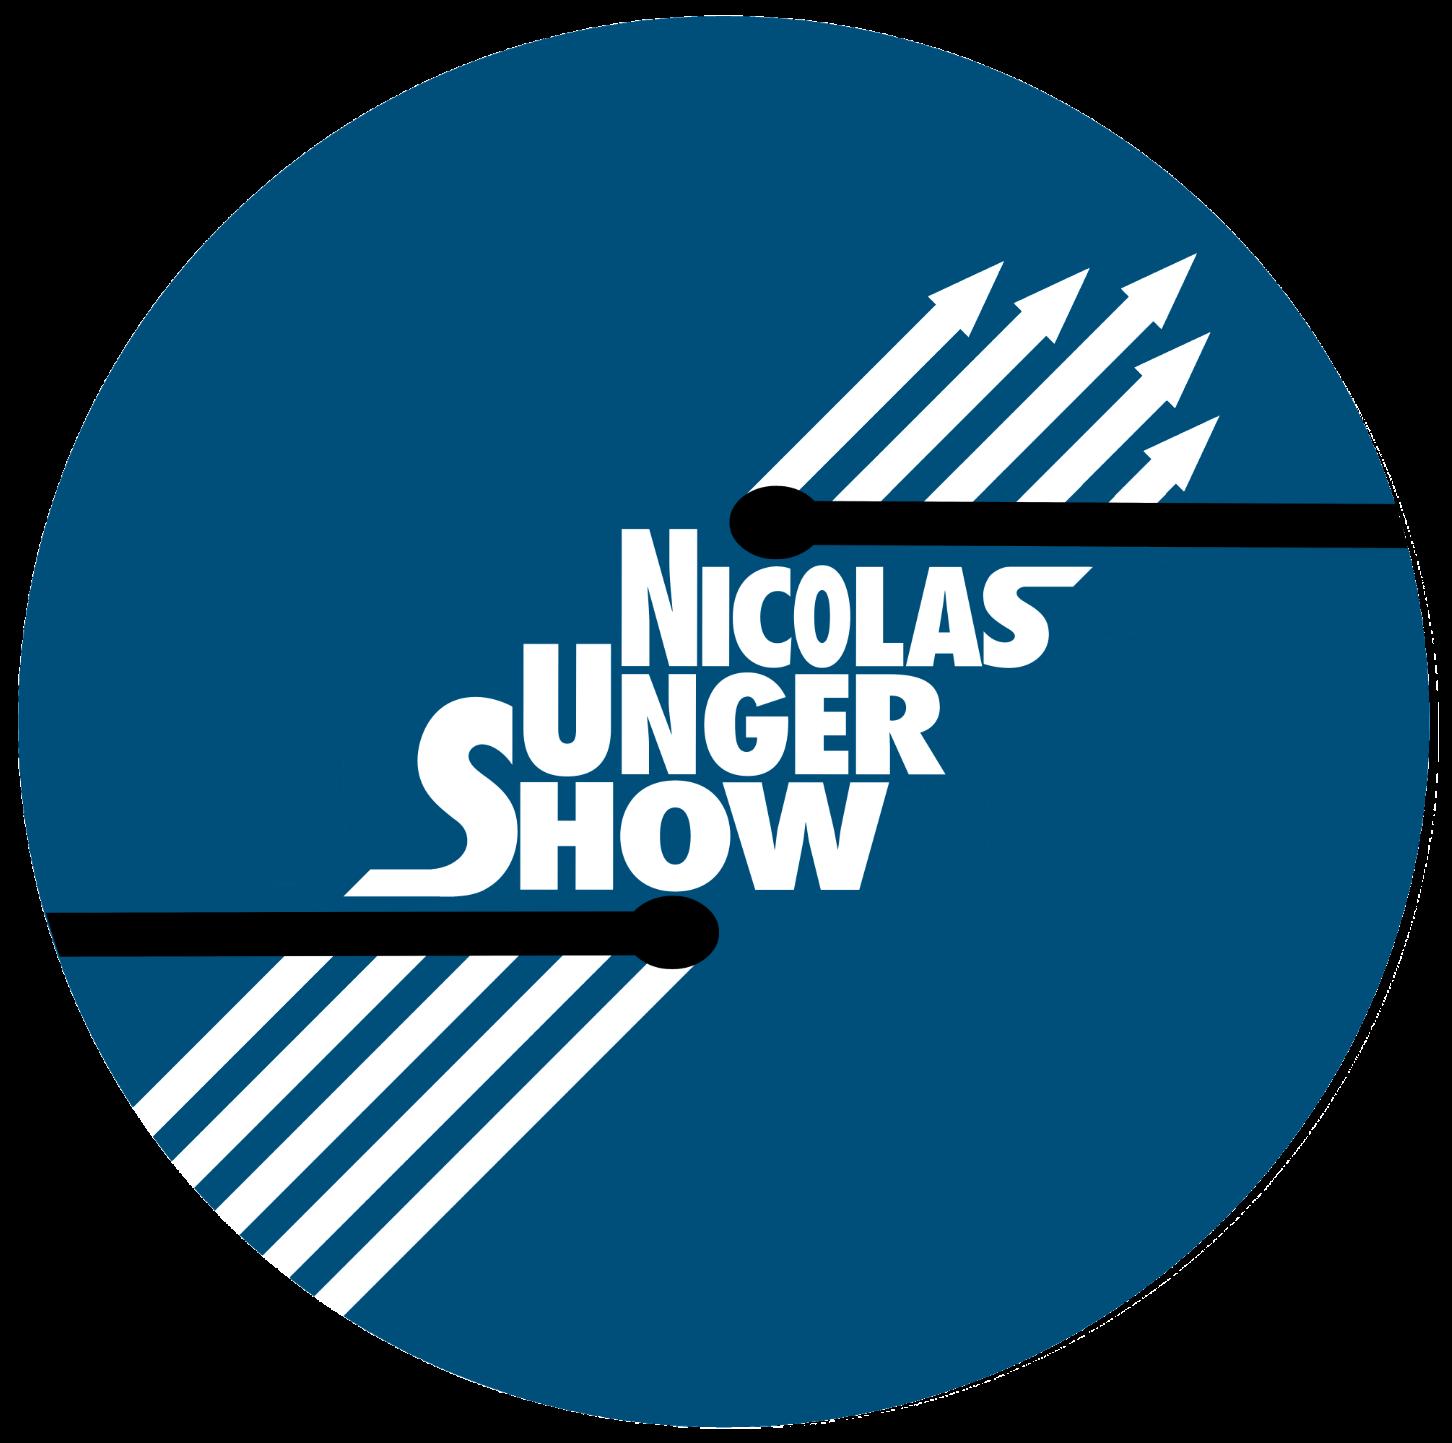 Die Nicolas Unger Show #NicolasUngerShow